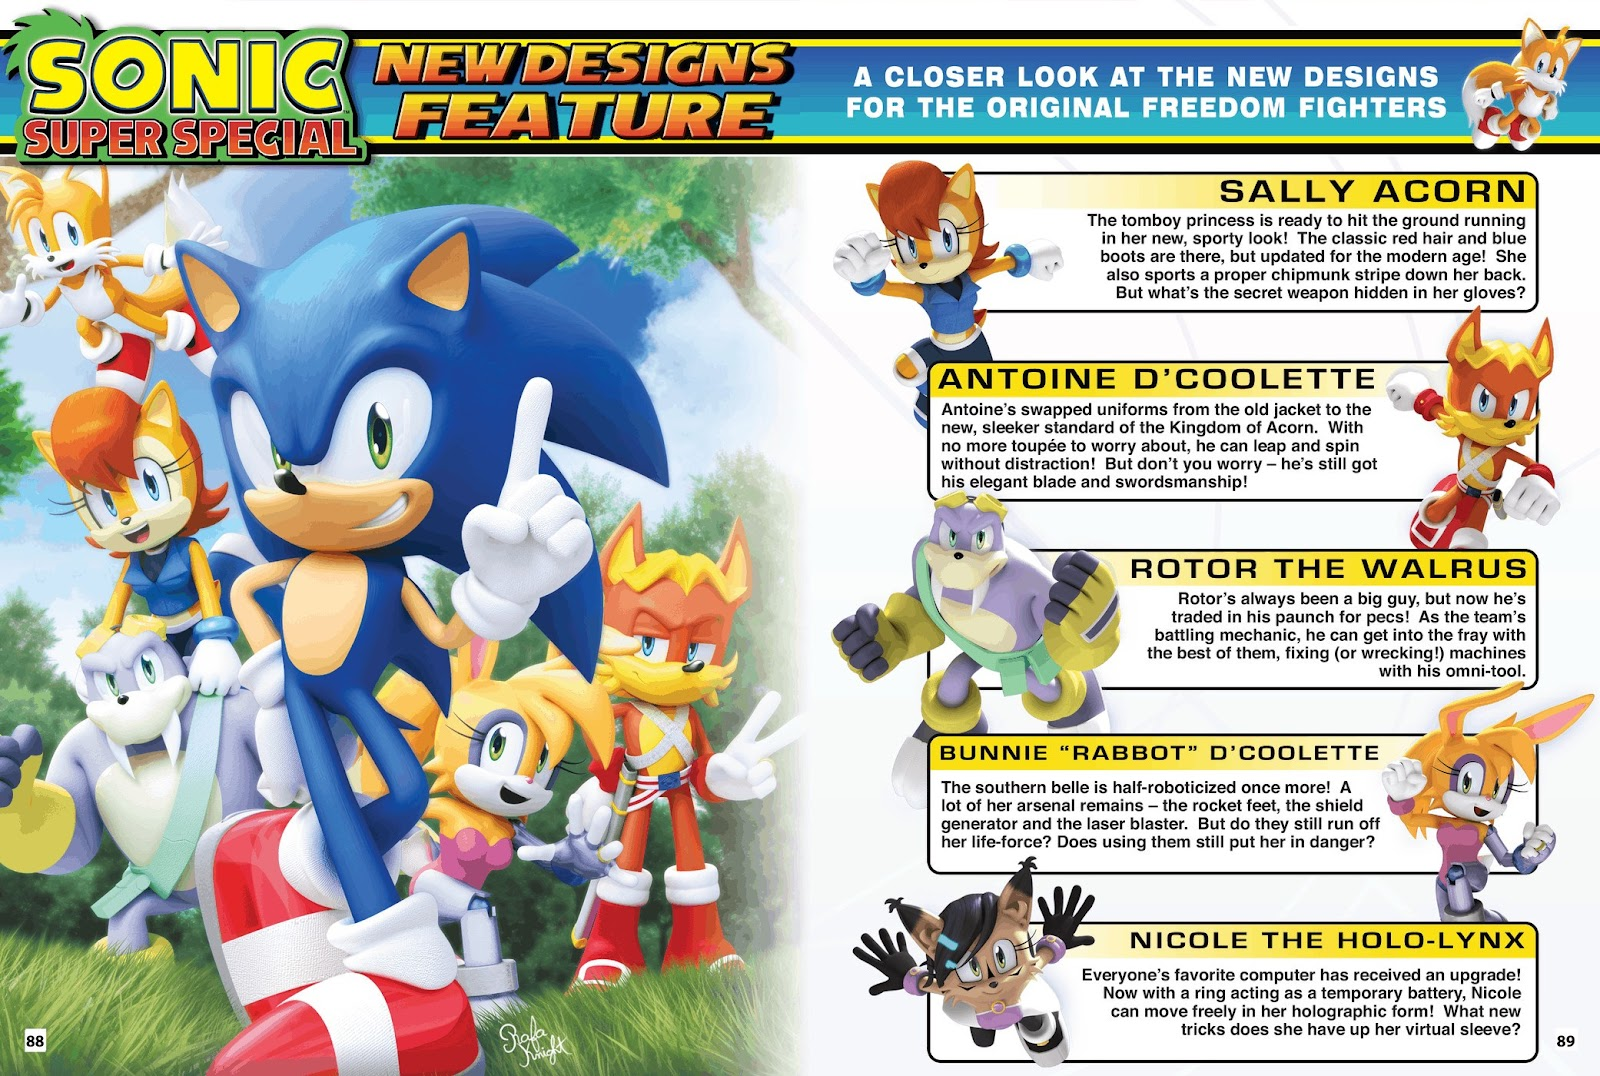 Comic Sonic Super Special Magazine issue 1